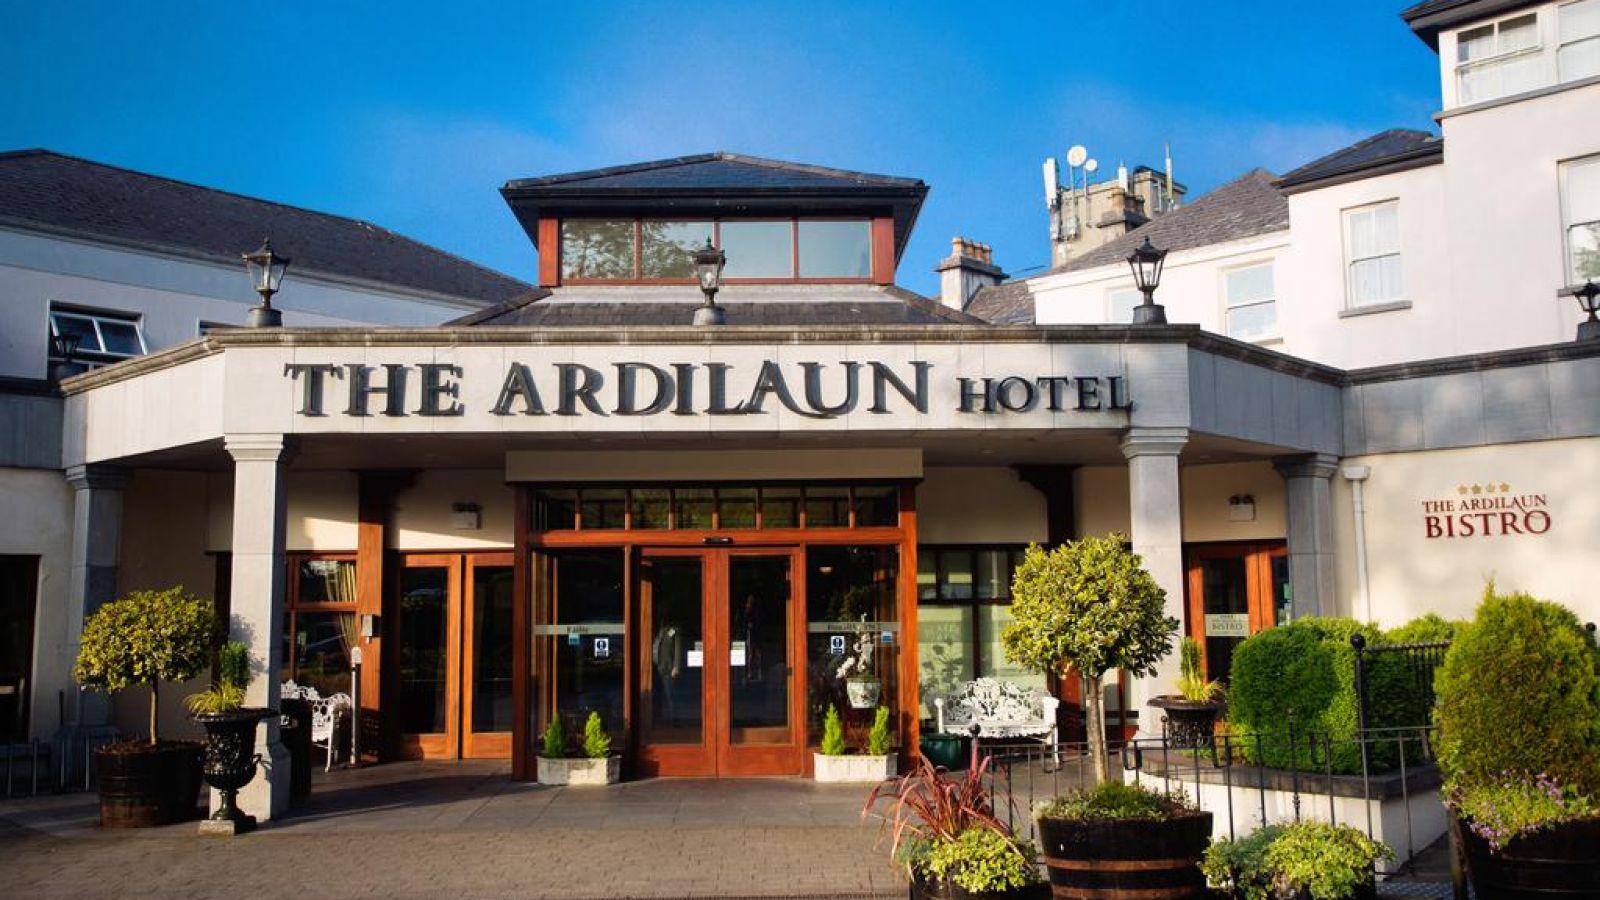 The Ardilaun Hotel - Galway